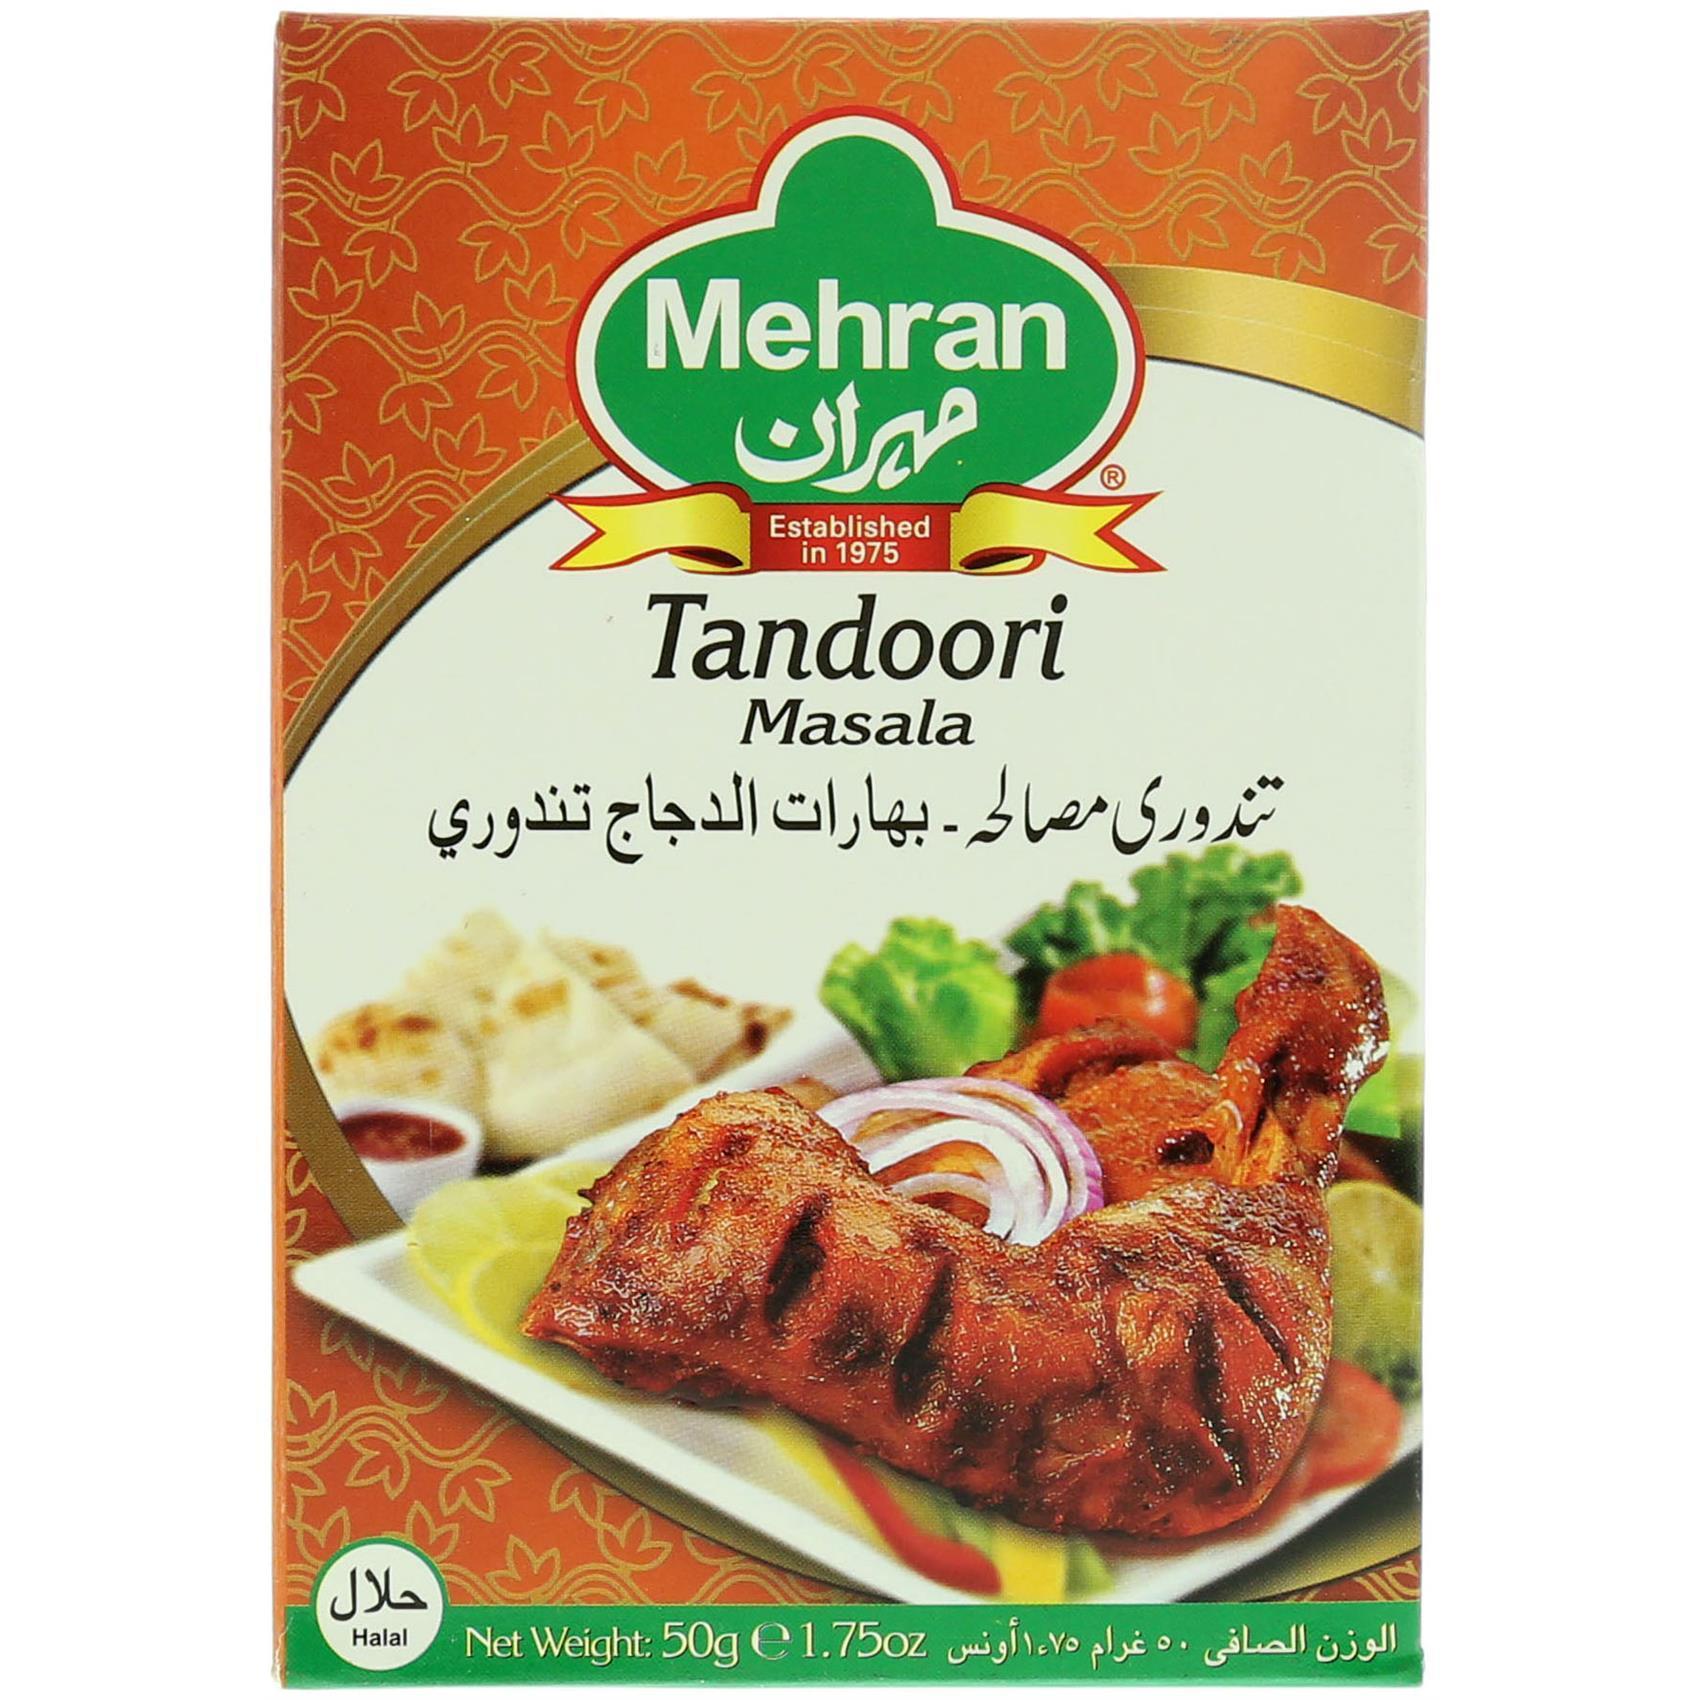 MEHRAN TANDOORI MASALA POWDER 50G